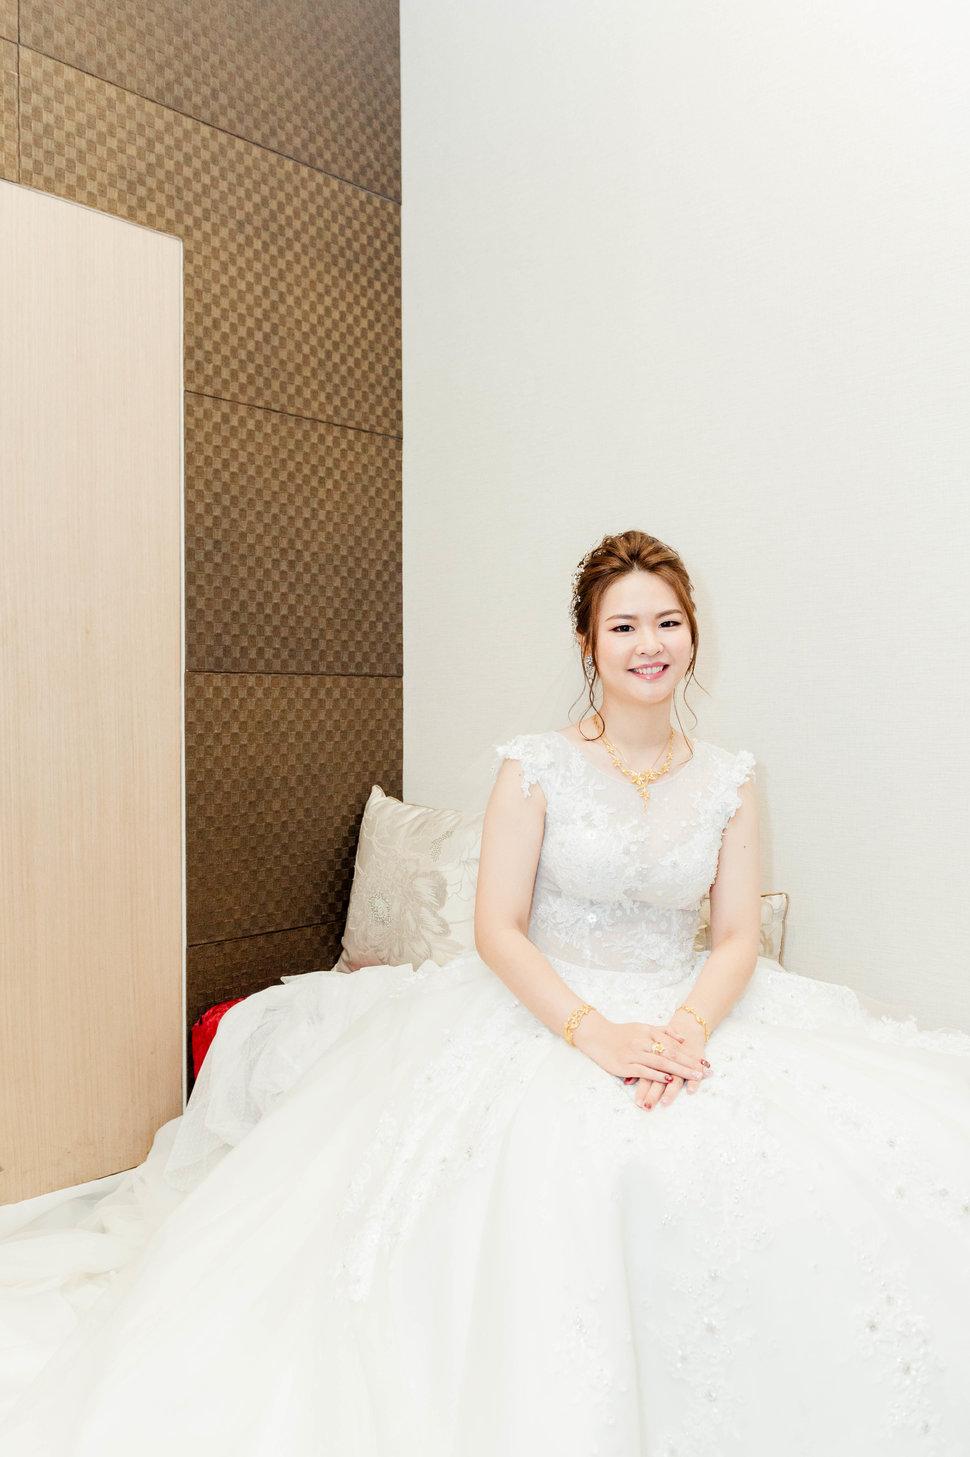 DSC_7450 - 大瑋哥Wedding攝影 - 結婚吧